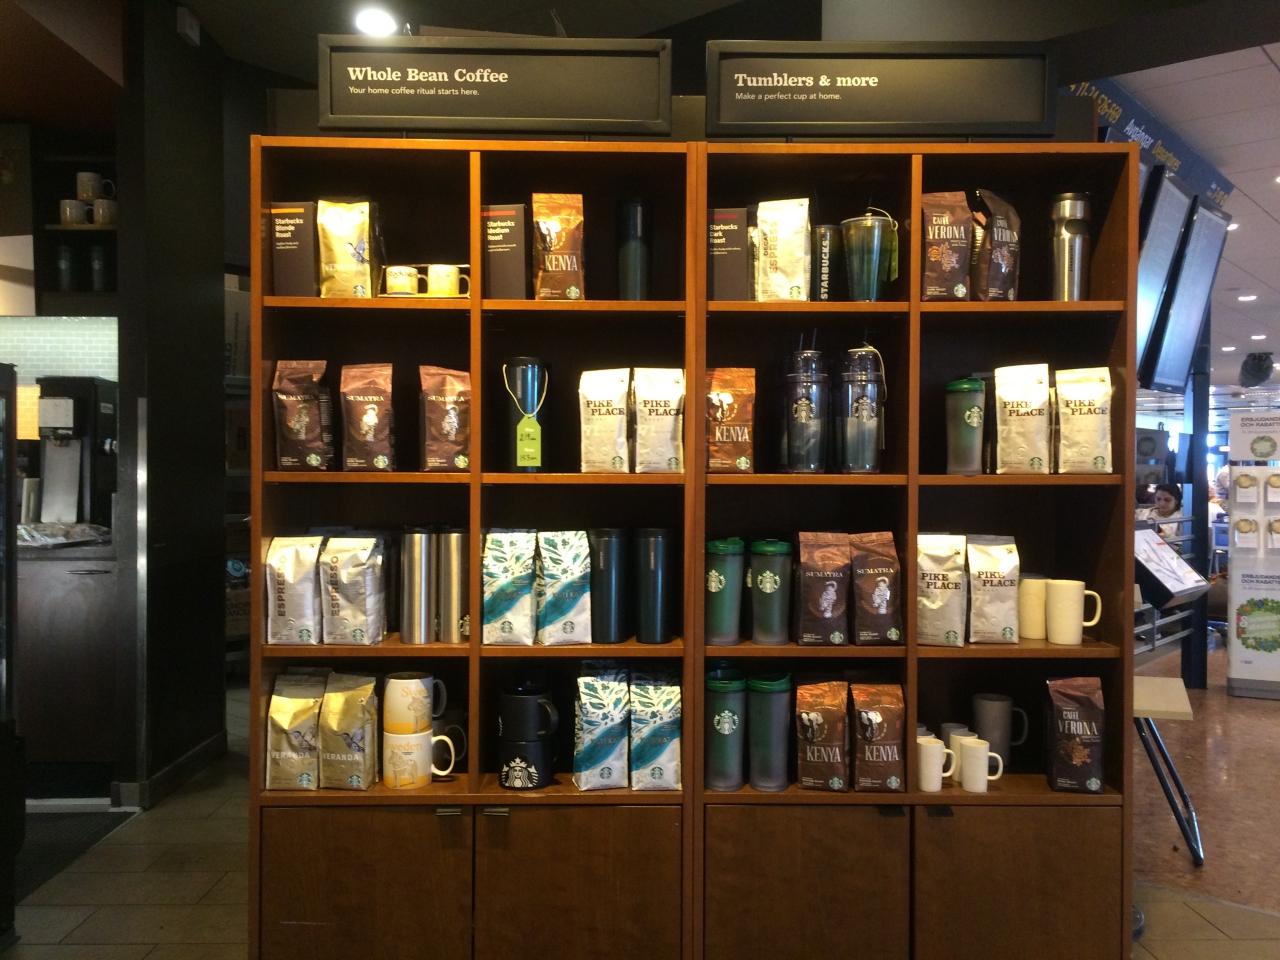 Starbucks at Stockholm Airport